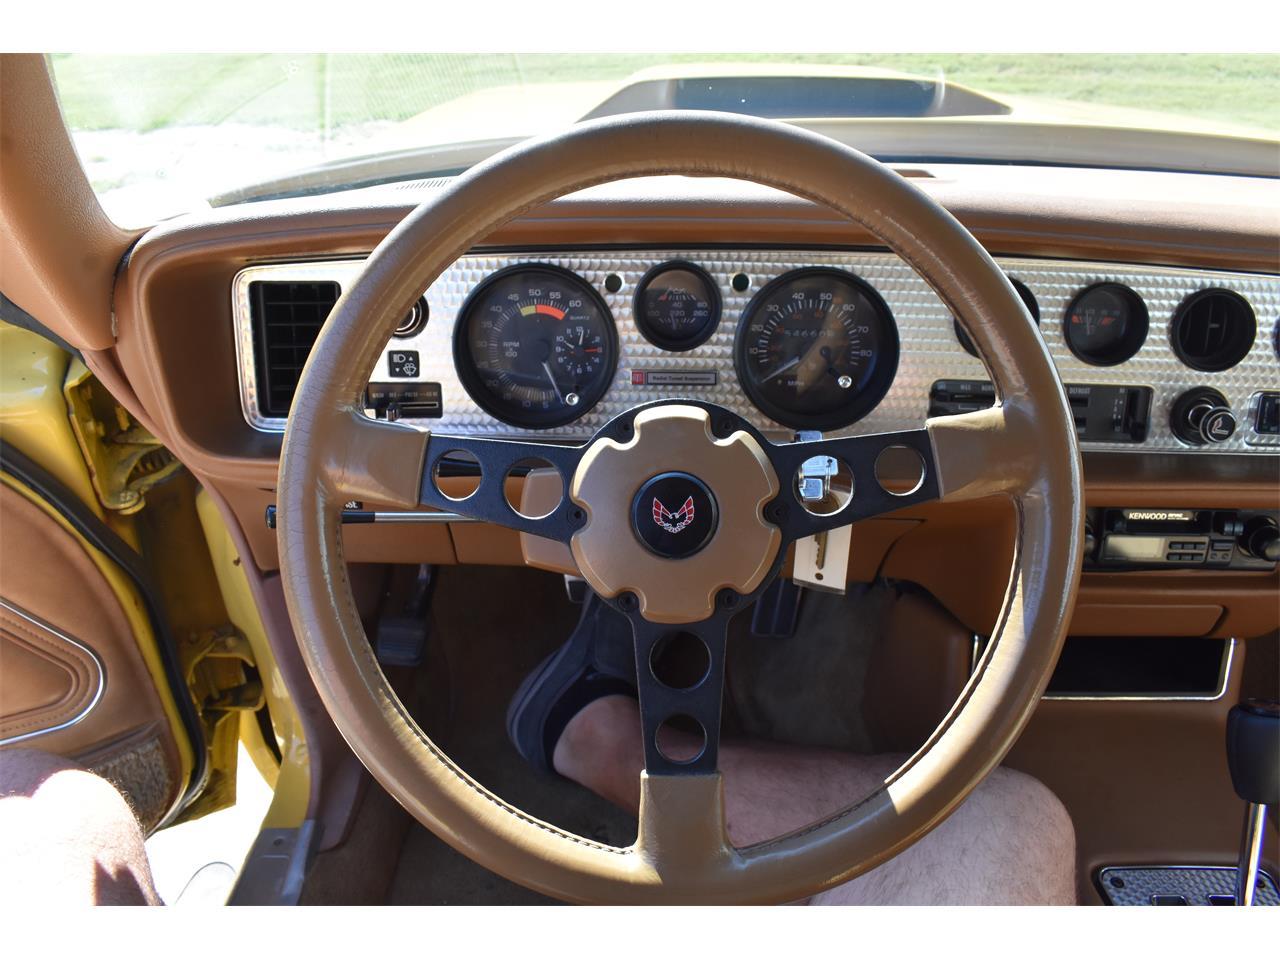 1980 Pontiac Firebird Trans Am (CC-1365165) for sale in Fairview, Pennsylvania